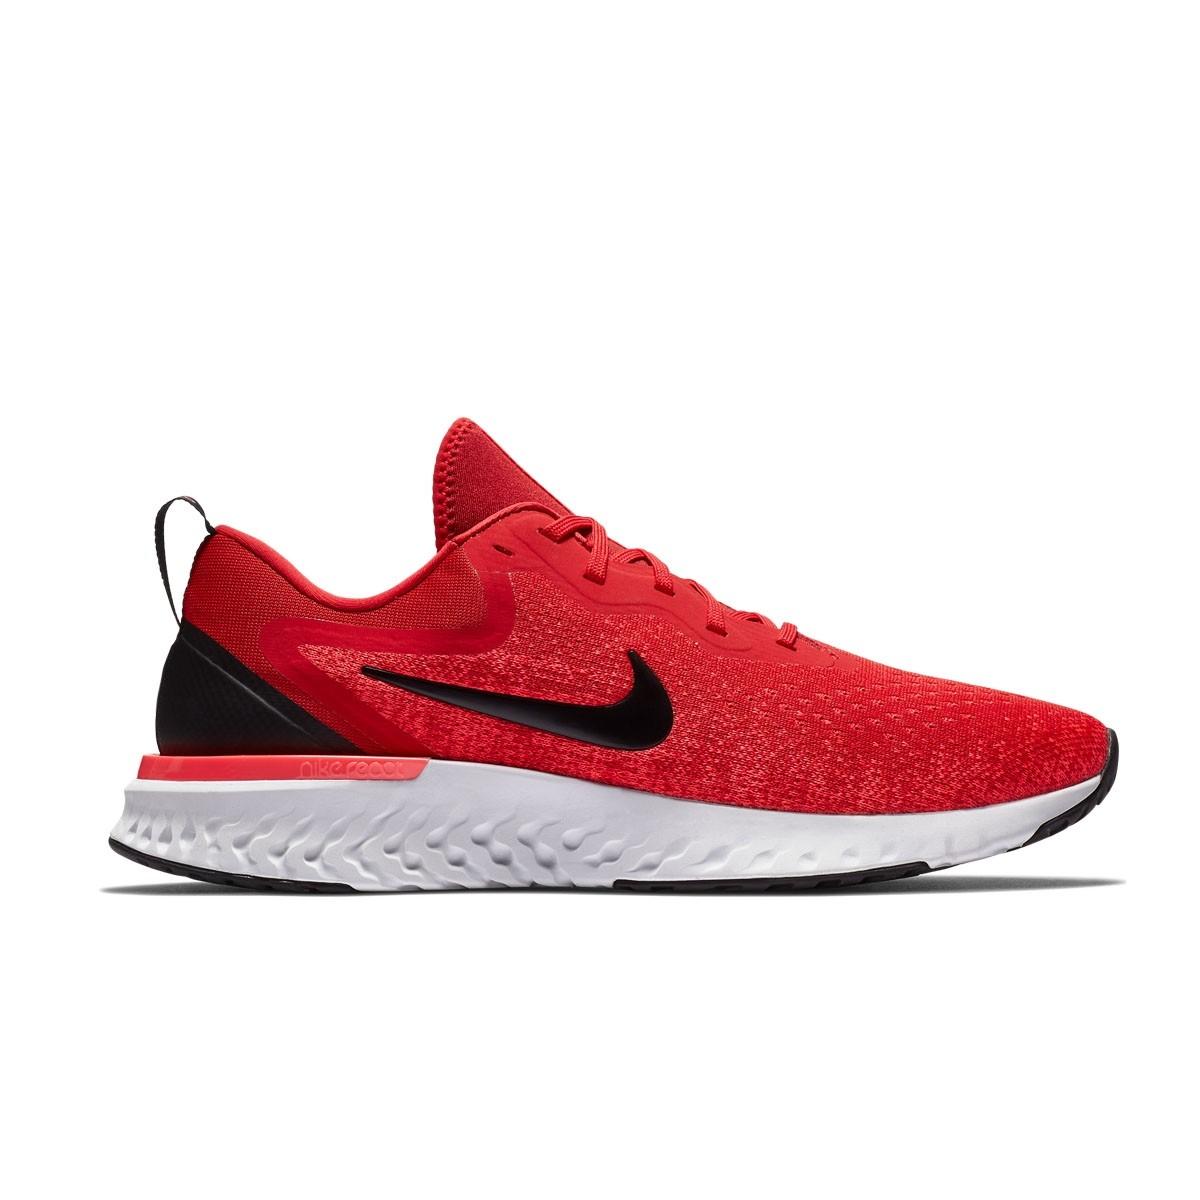 Buy Nike Odyssey React 'Red' Basketball